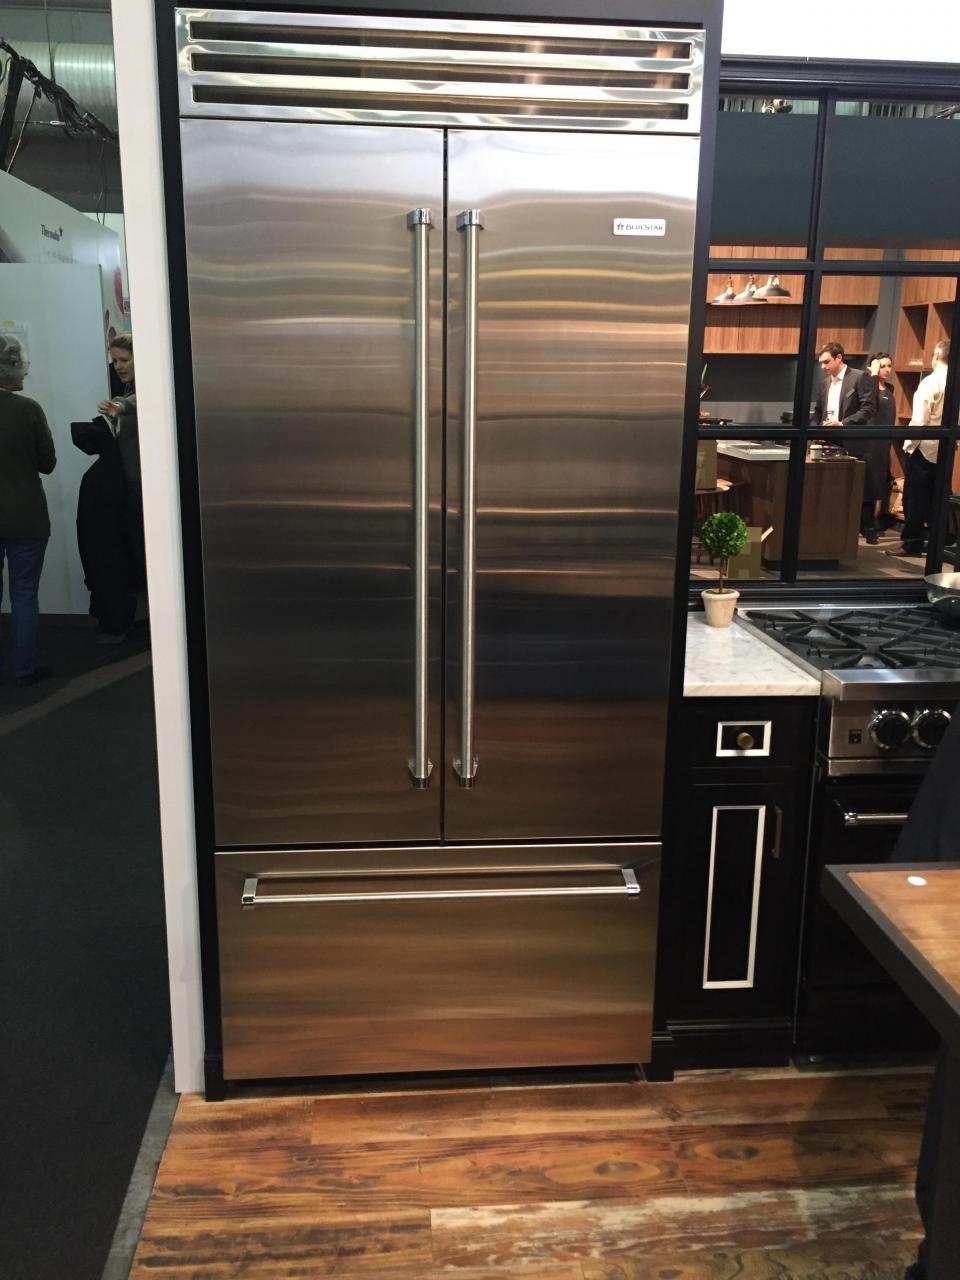 BlueStar fridge